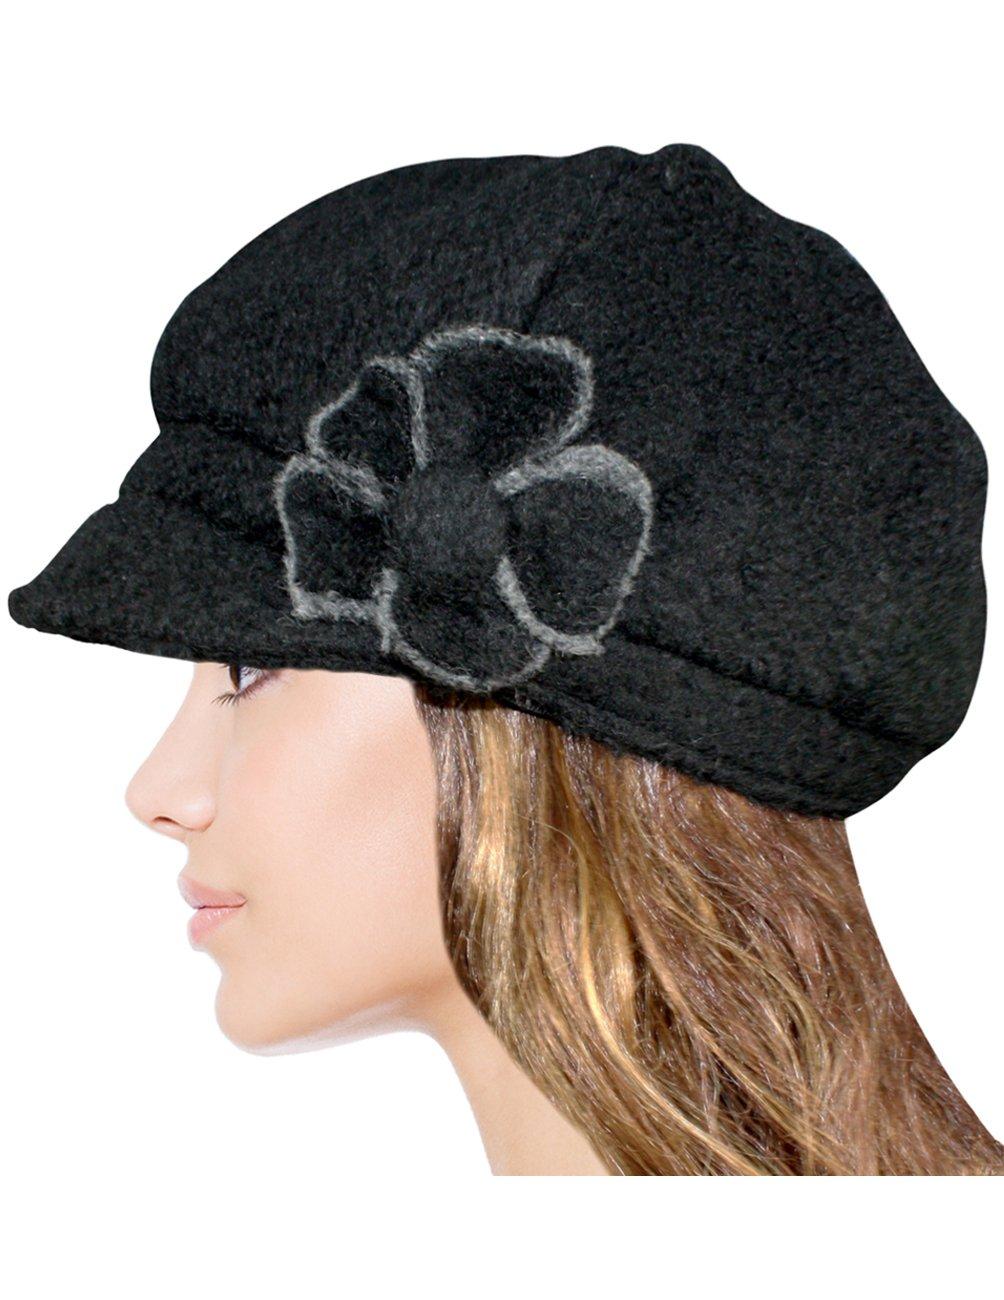 Dahlia Women's Chic Flower Newsboy Cap Hat Wool Blend - Dual Layer, Black by Dahlia (Image #4)